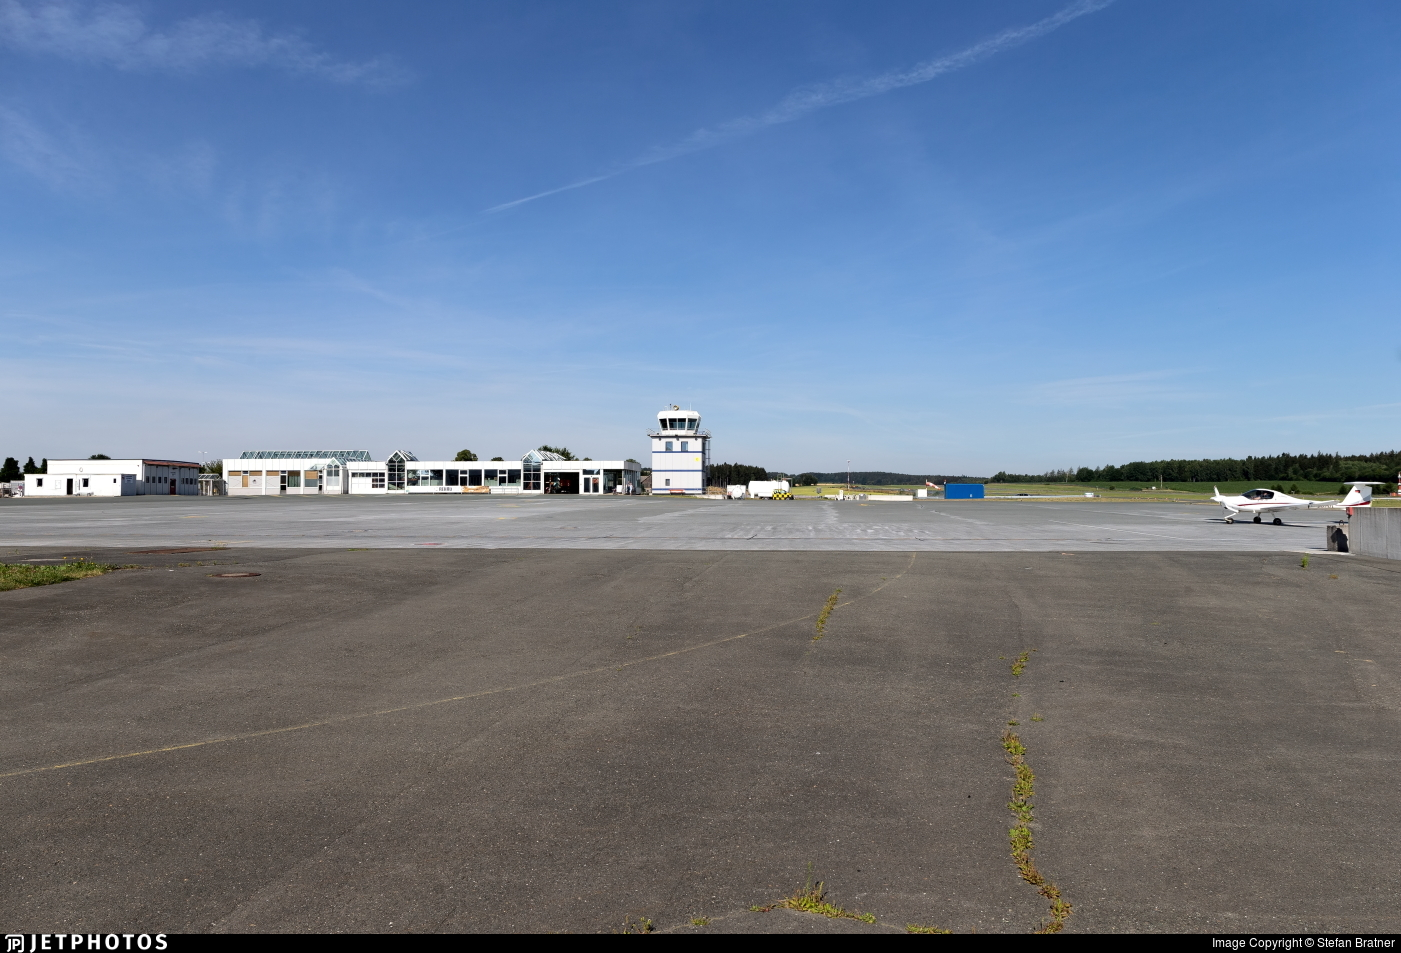 EDQM - Airport - Ramp